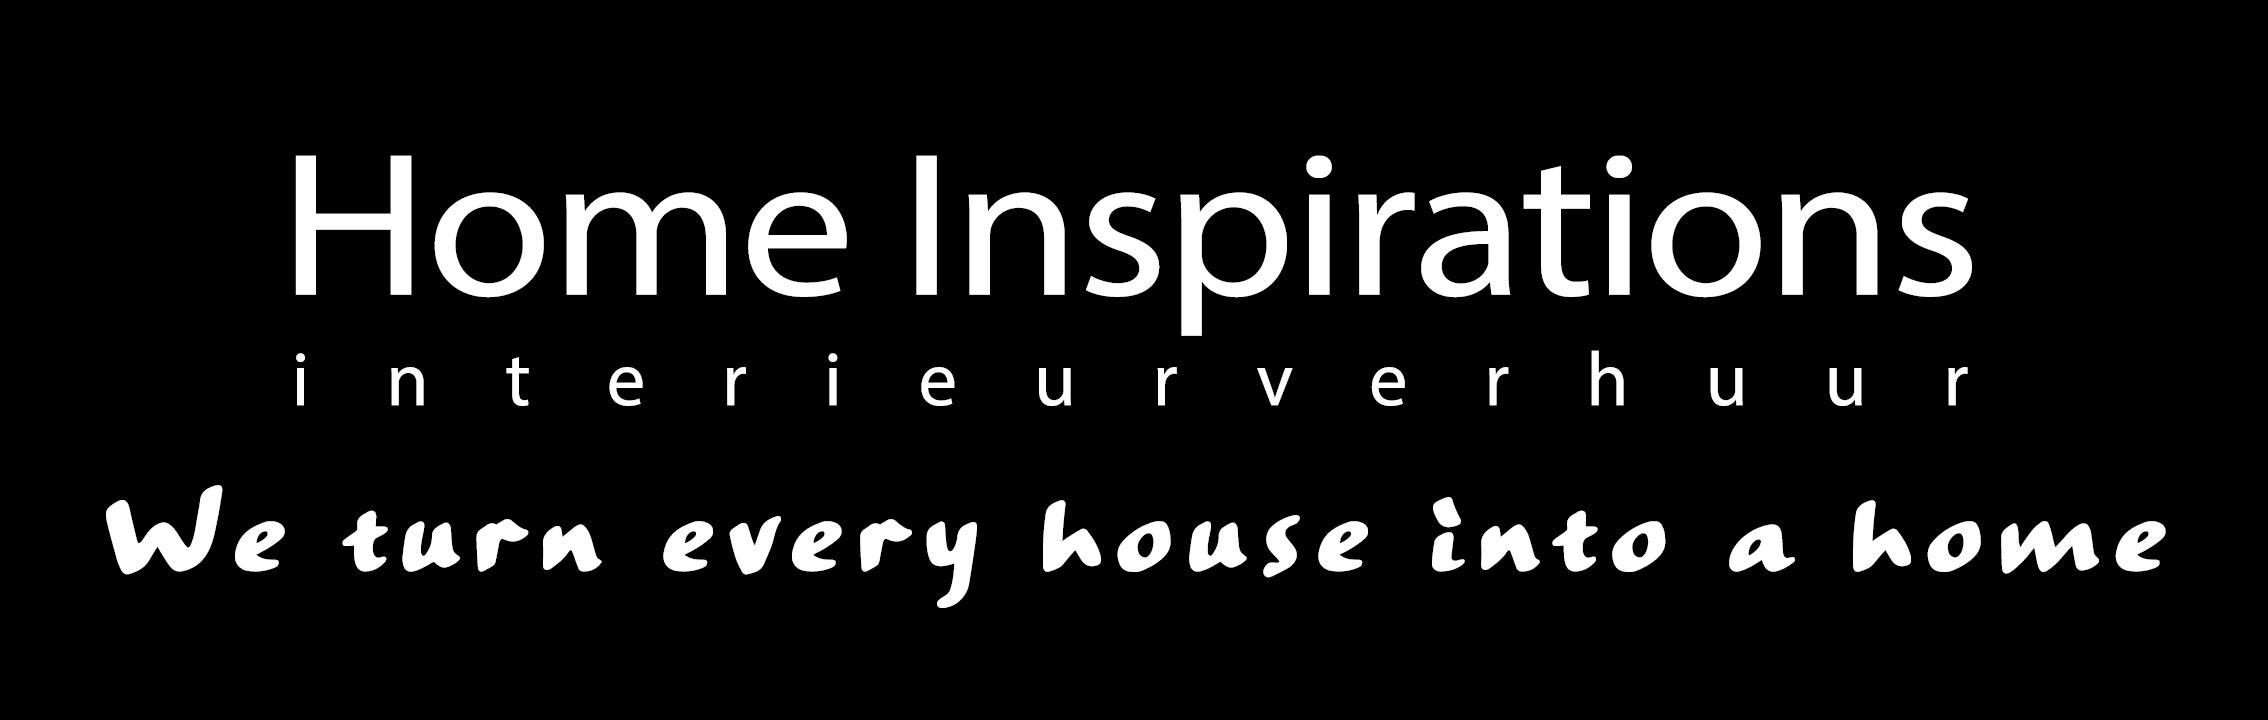 sticker versie 3 Home Inspirations.png